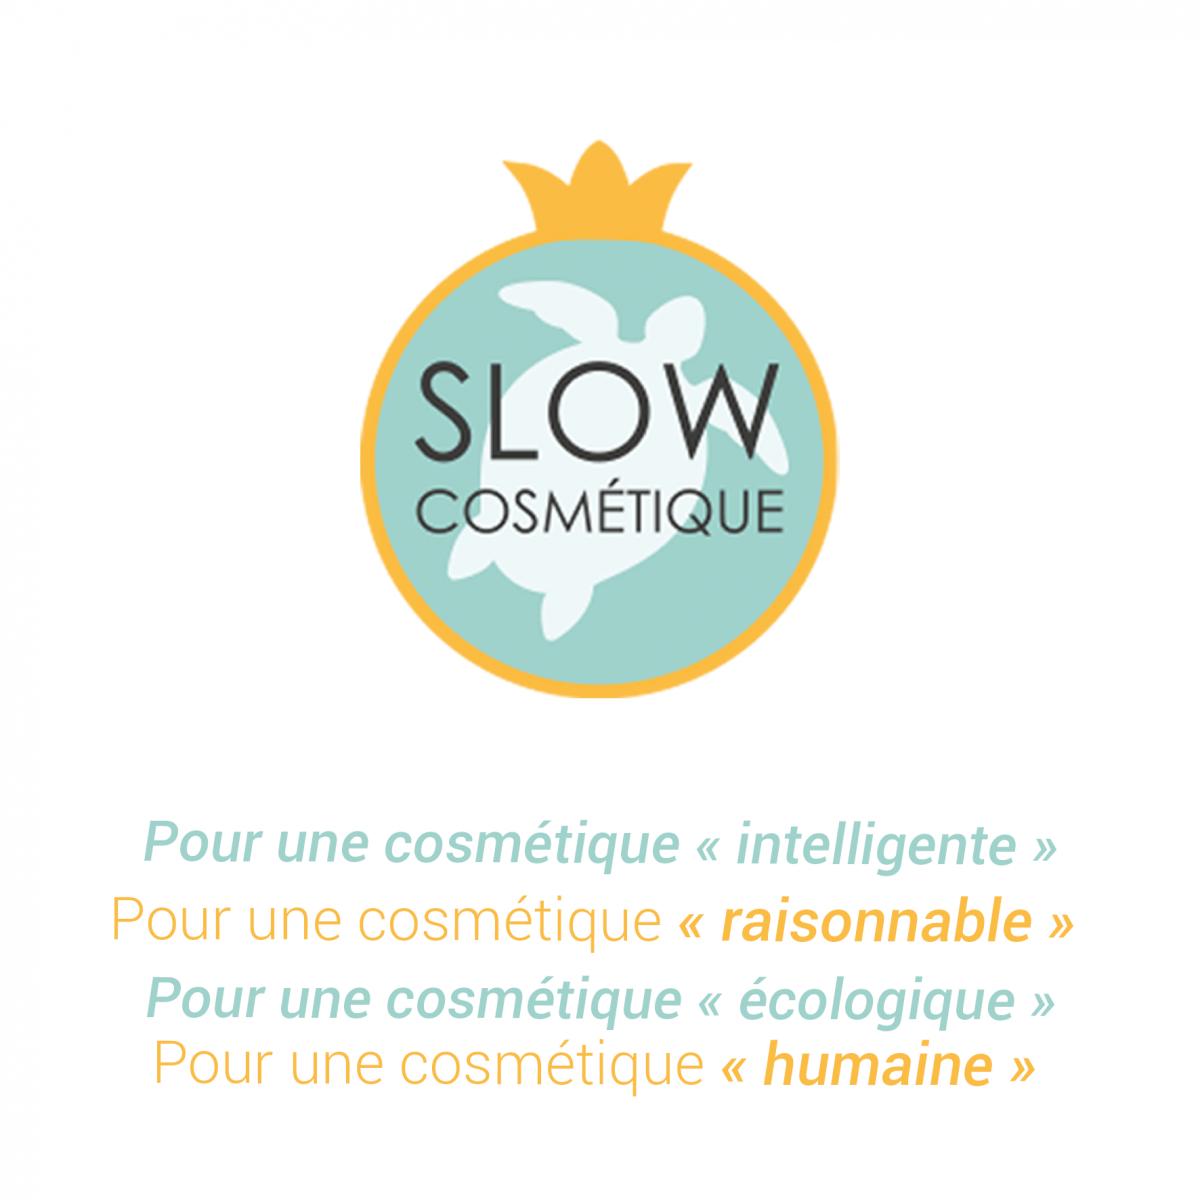 SLOWCOSMETIQUE_Label_KERALI